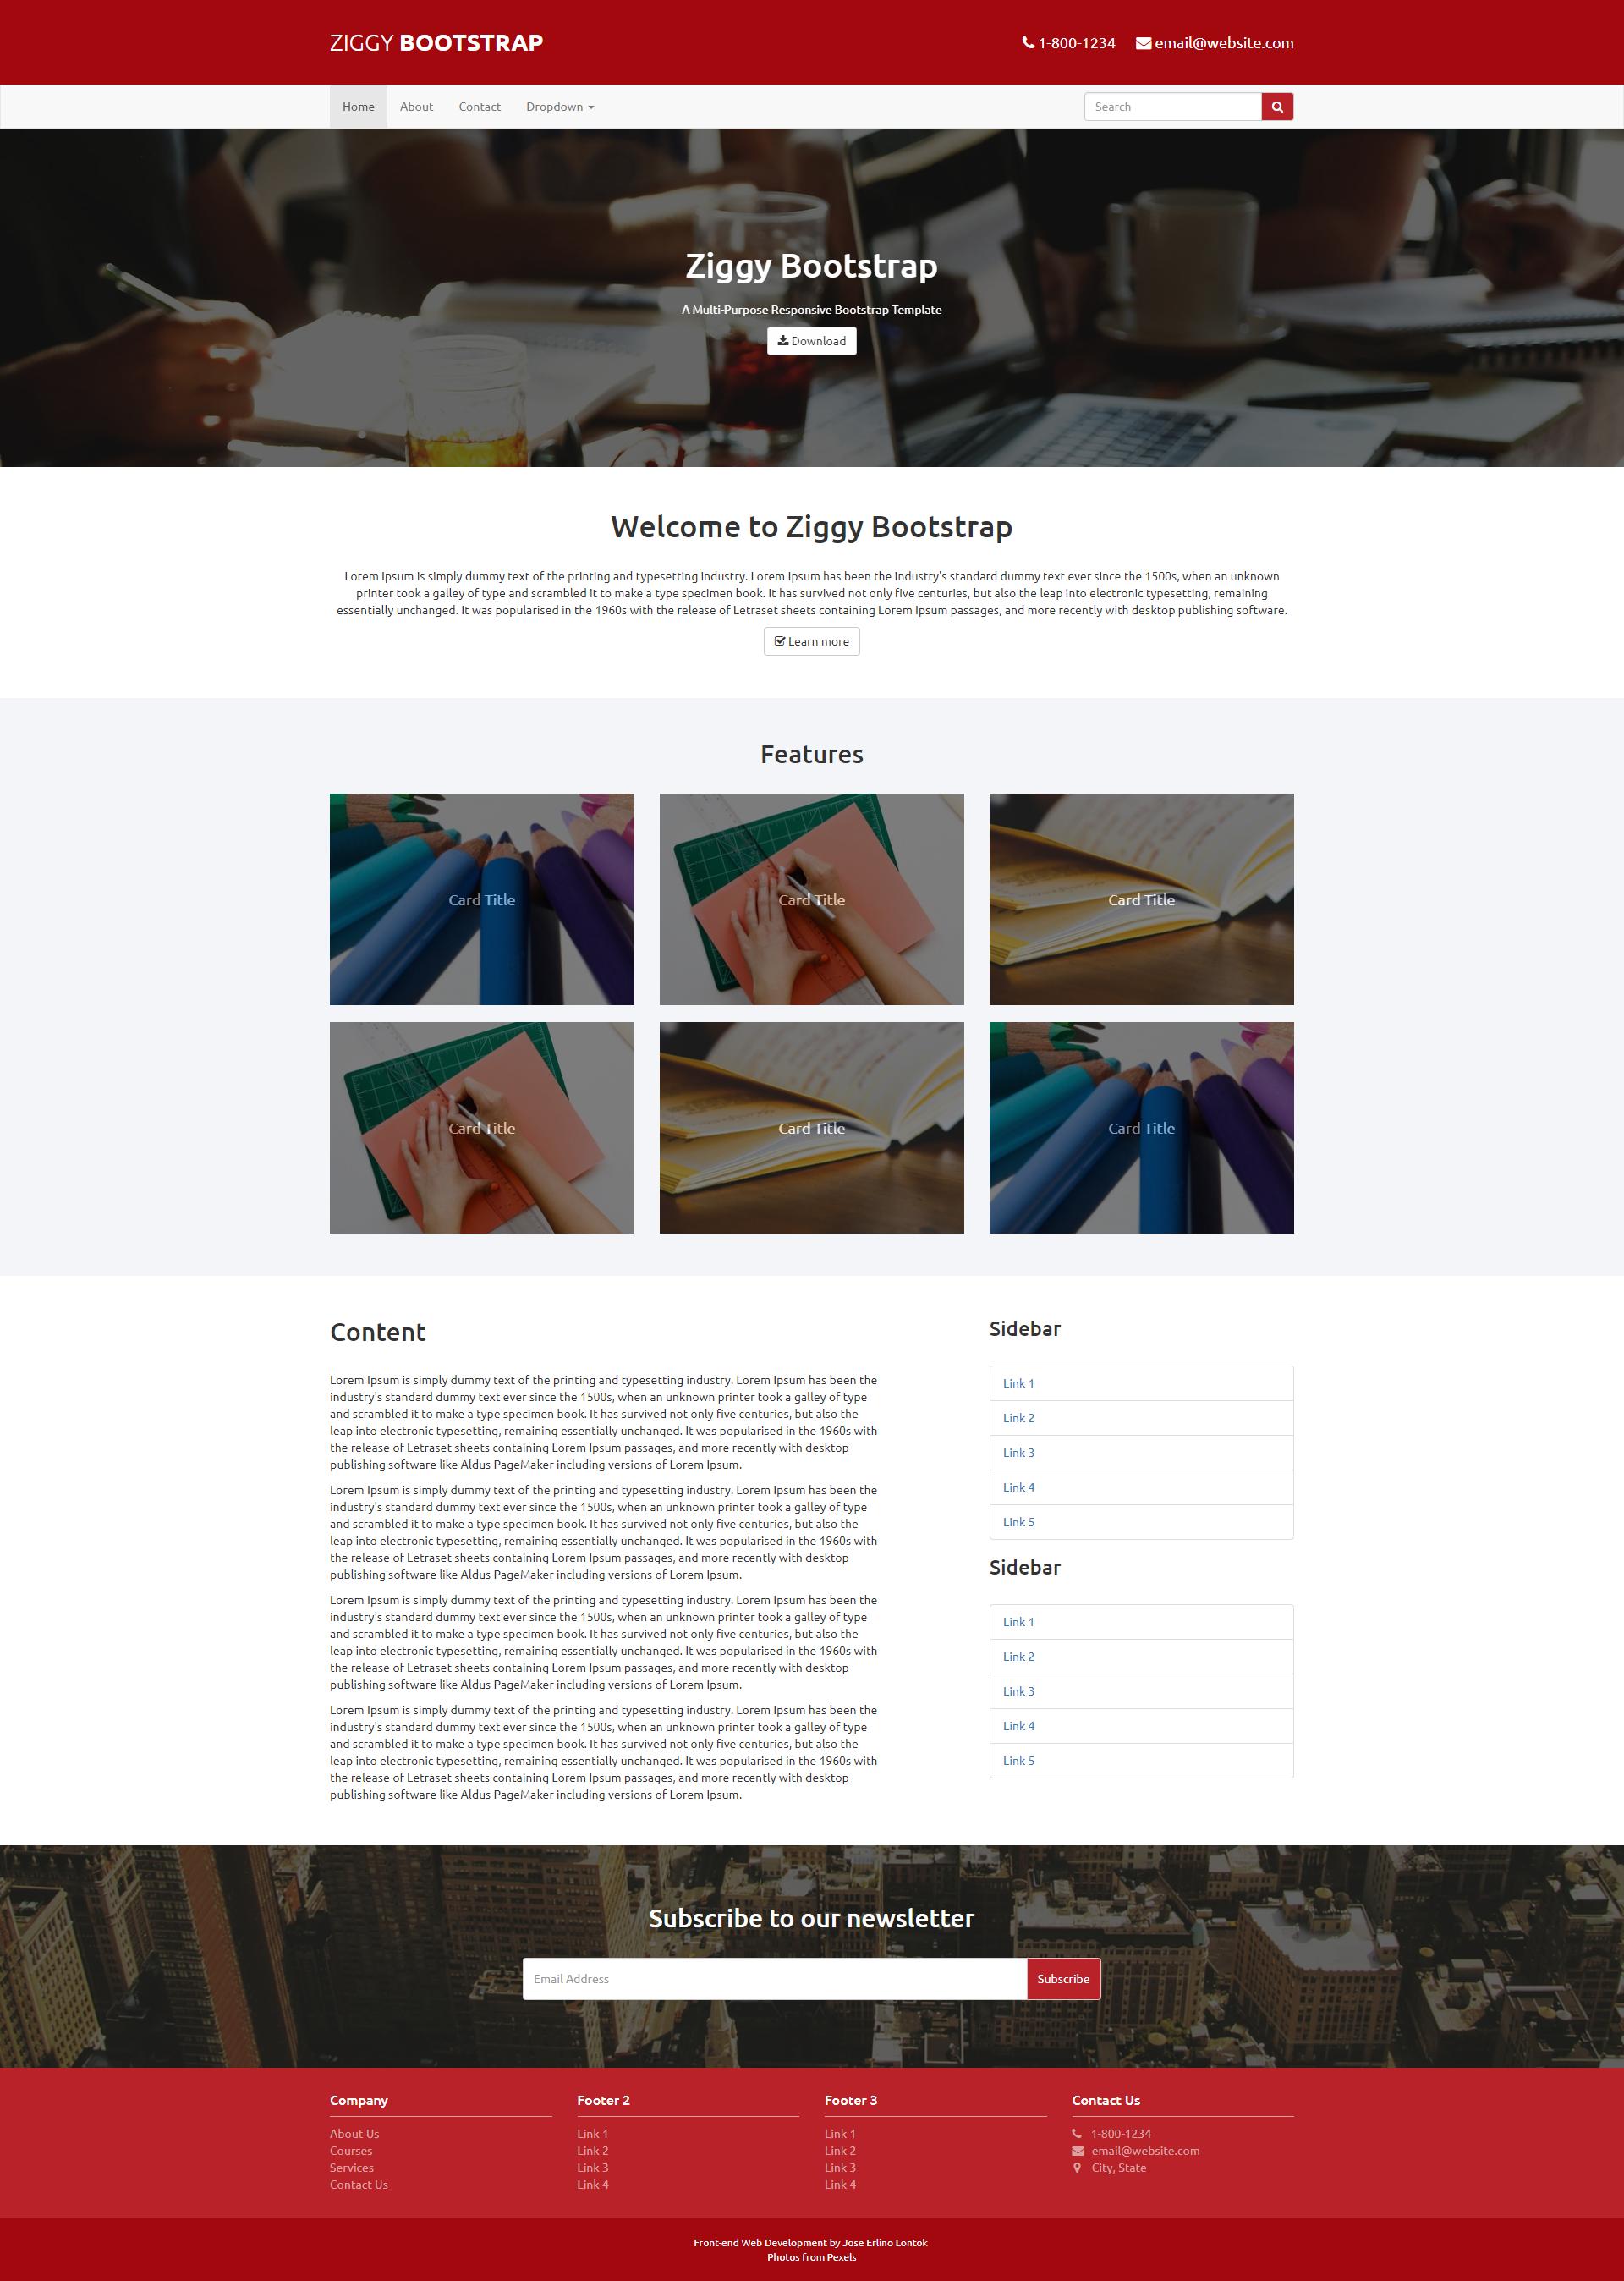 Ziggy Bootstrap - A Multi-Purpose Reponsive Bootstrap Template.